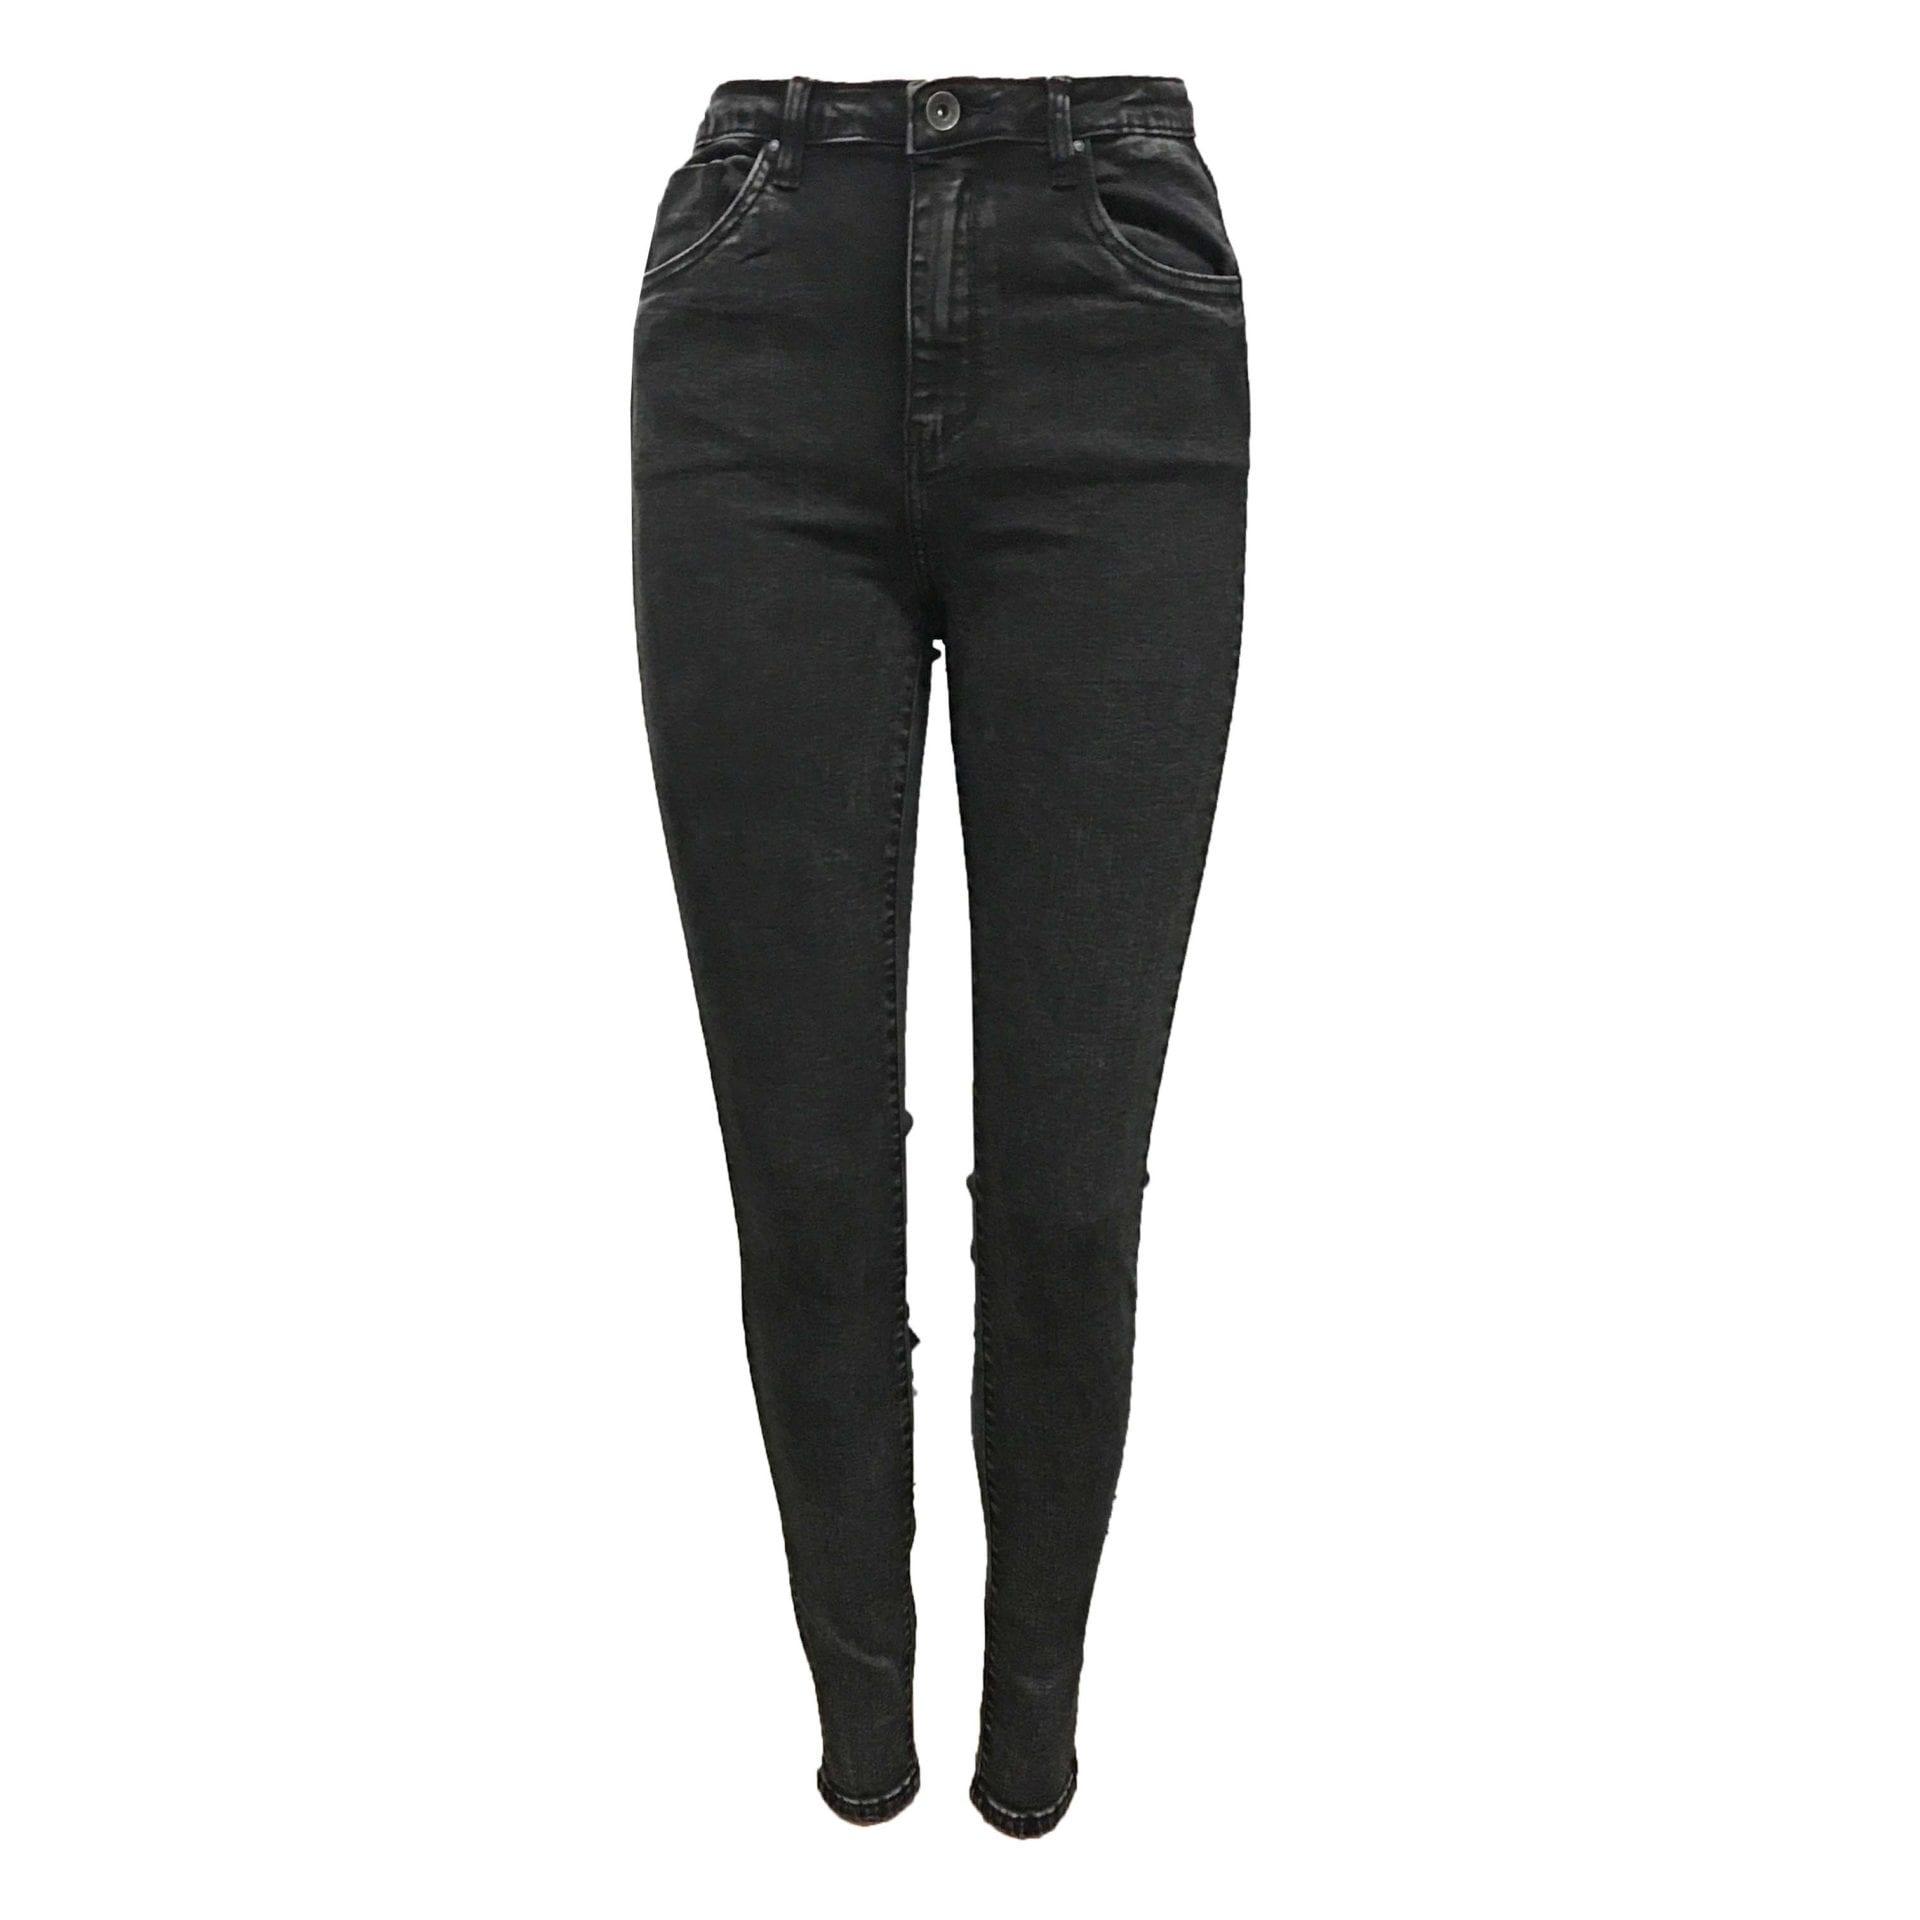 Ladybugs High waist basic jeans L 185 - J 20